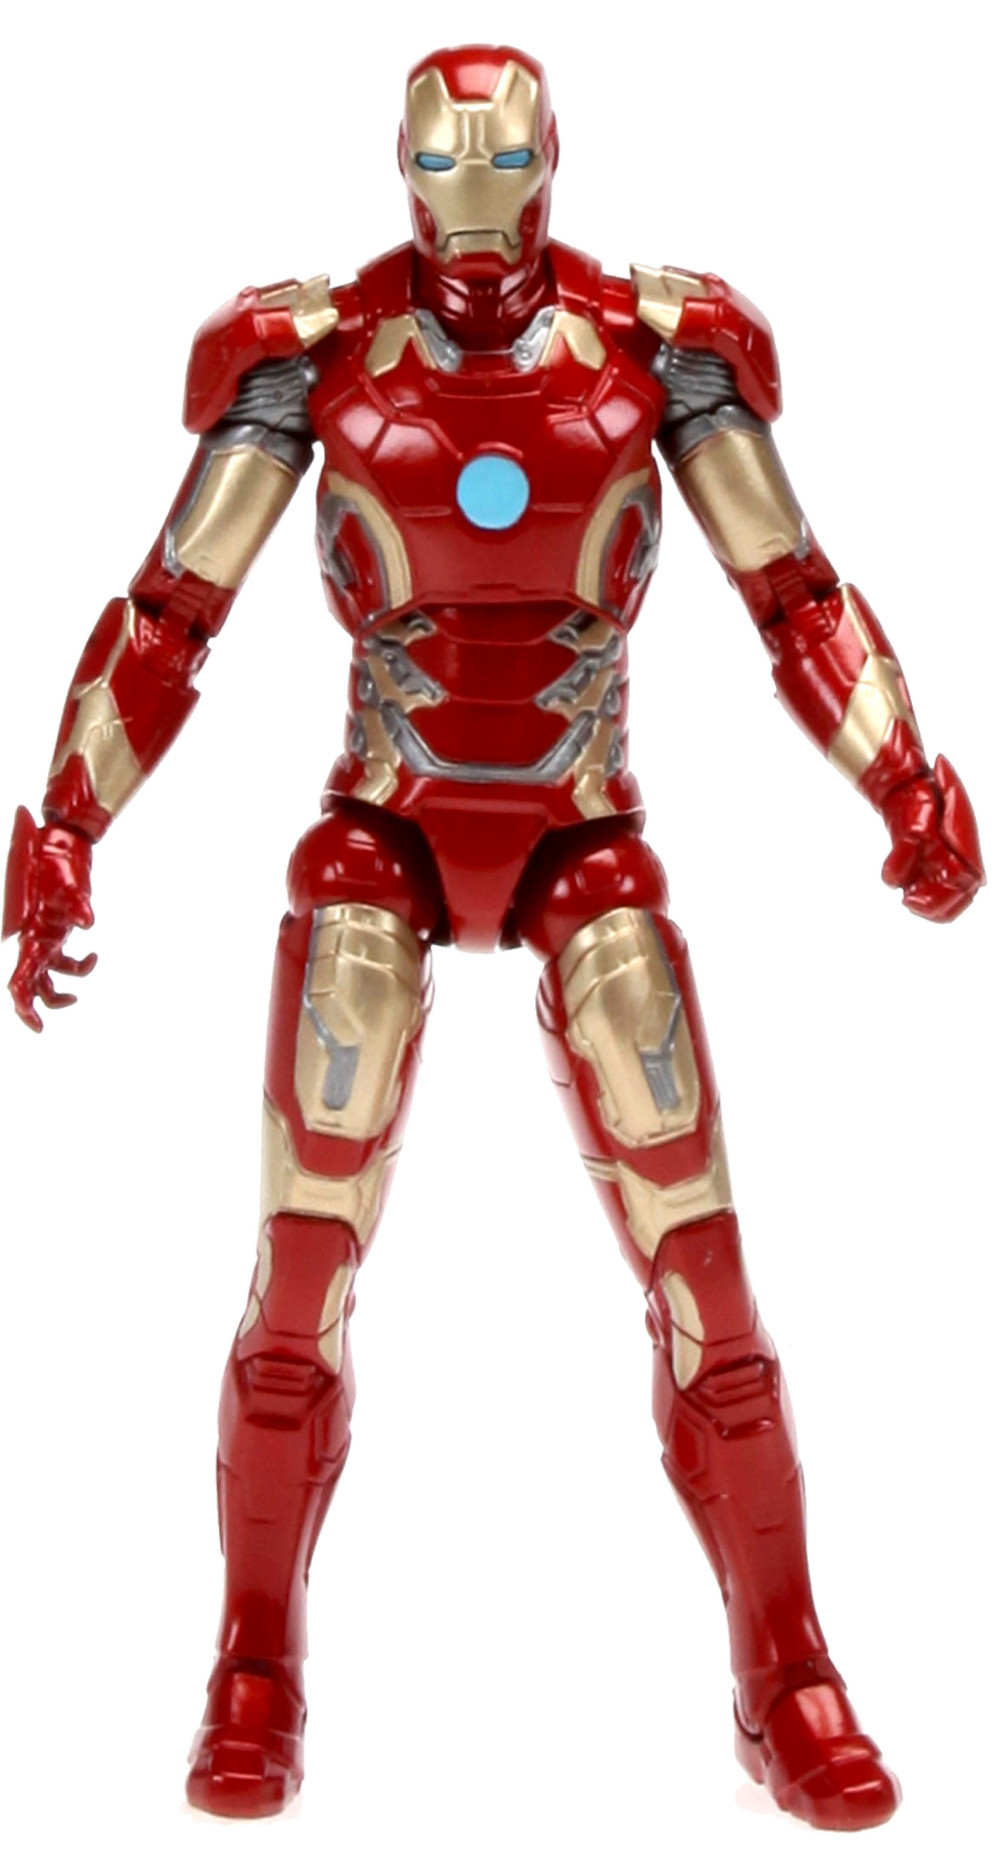 AvengersWave2-Iron-Man-Mk-43.jpg